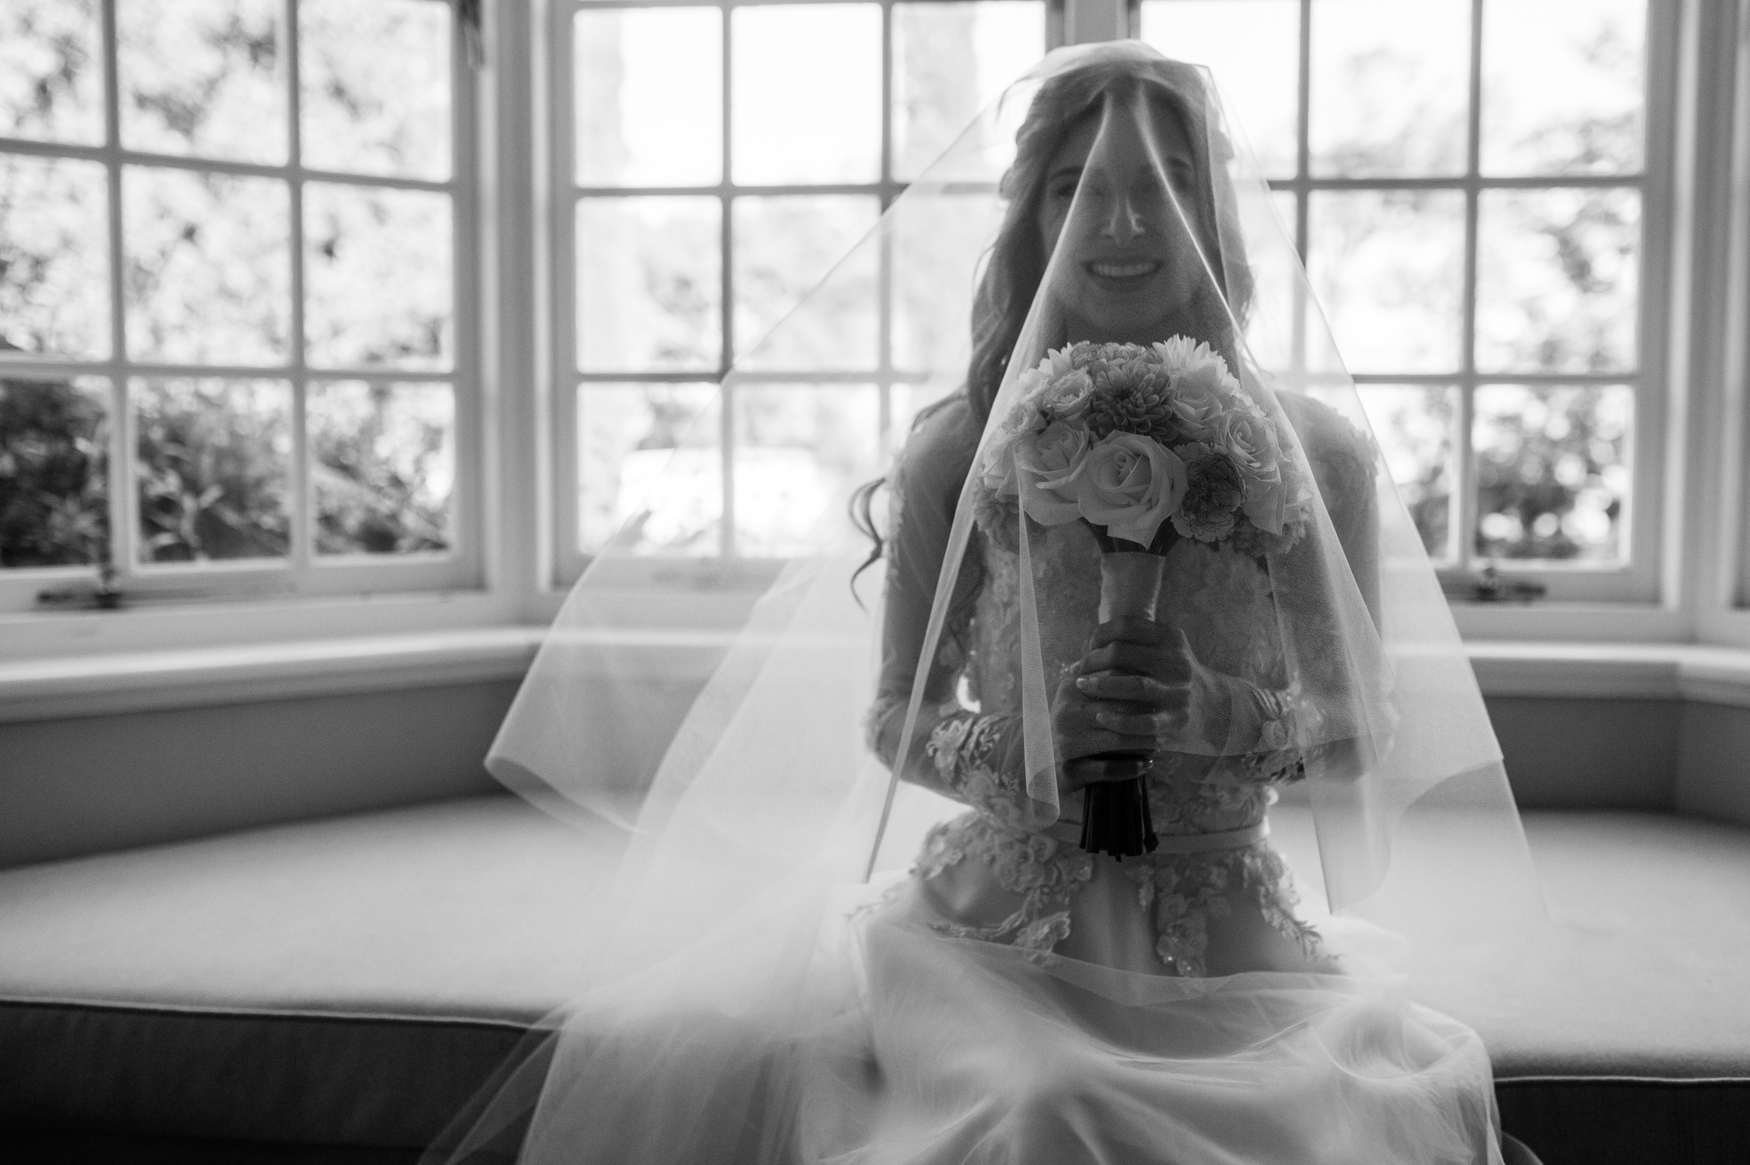 Leon_&_Martine's_Wedding_Photographs_17th_April_2019_@johnhenryweddingphoto_Low_Resolution_Web-193.JPG